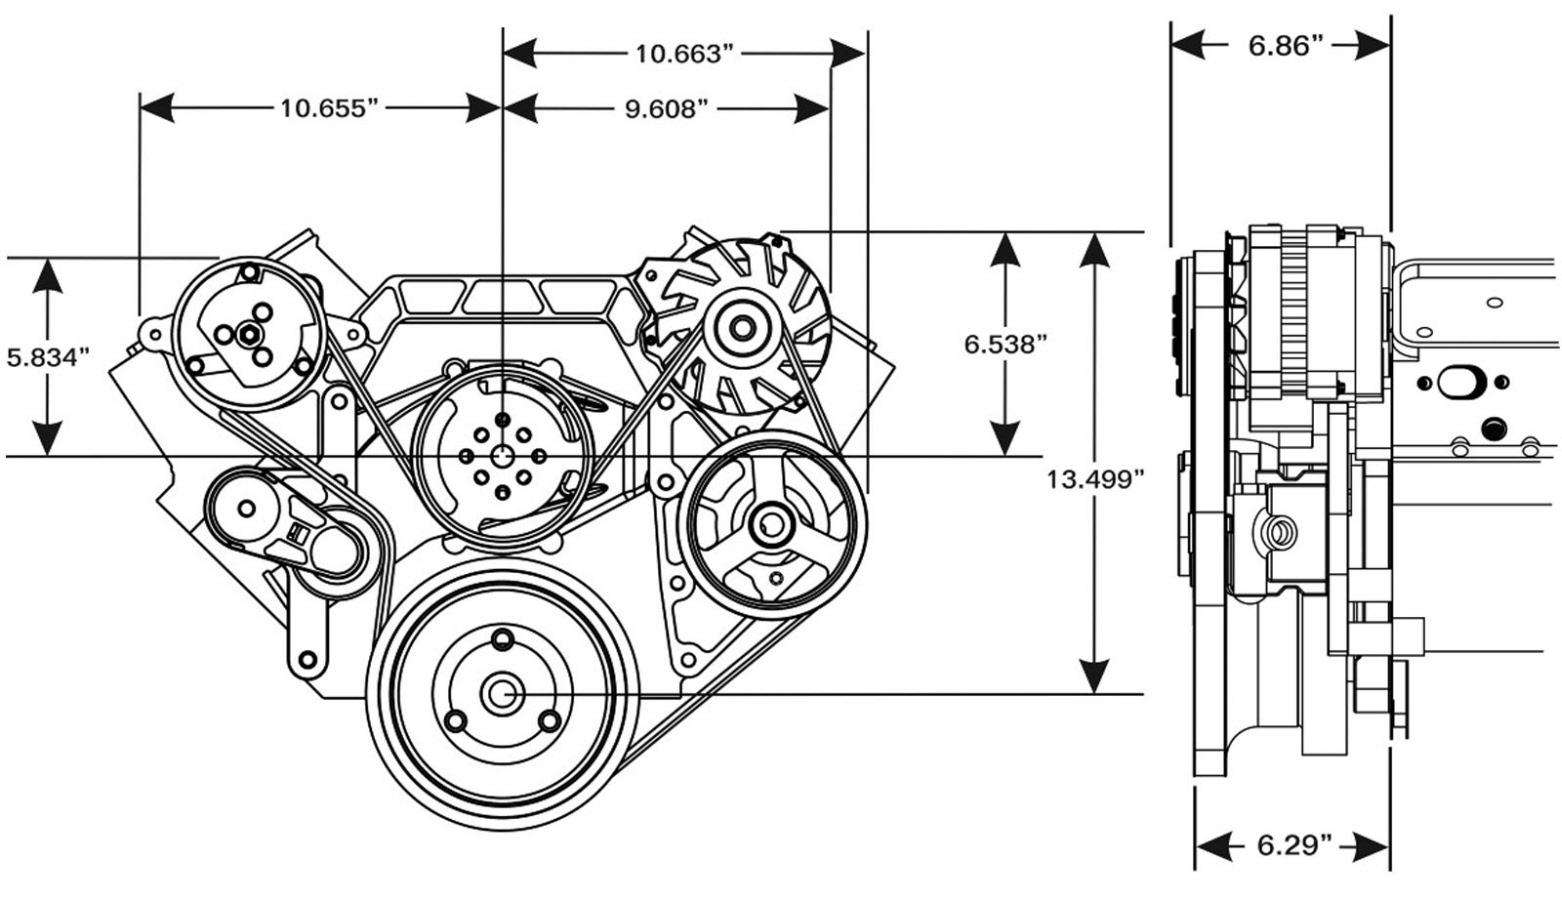 Chevy G20 Van Wiring Diagram On 2004 Volvo Penta Alternator Wiring